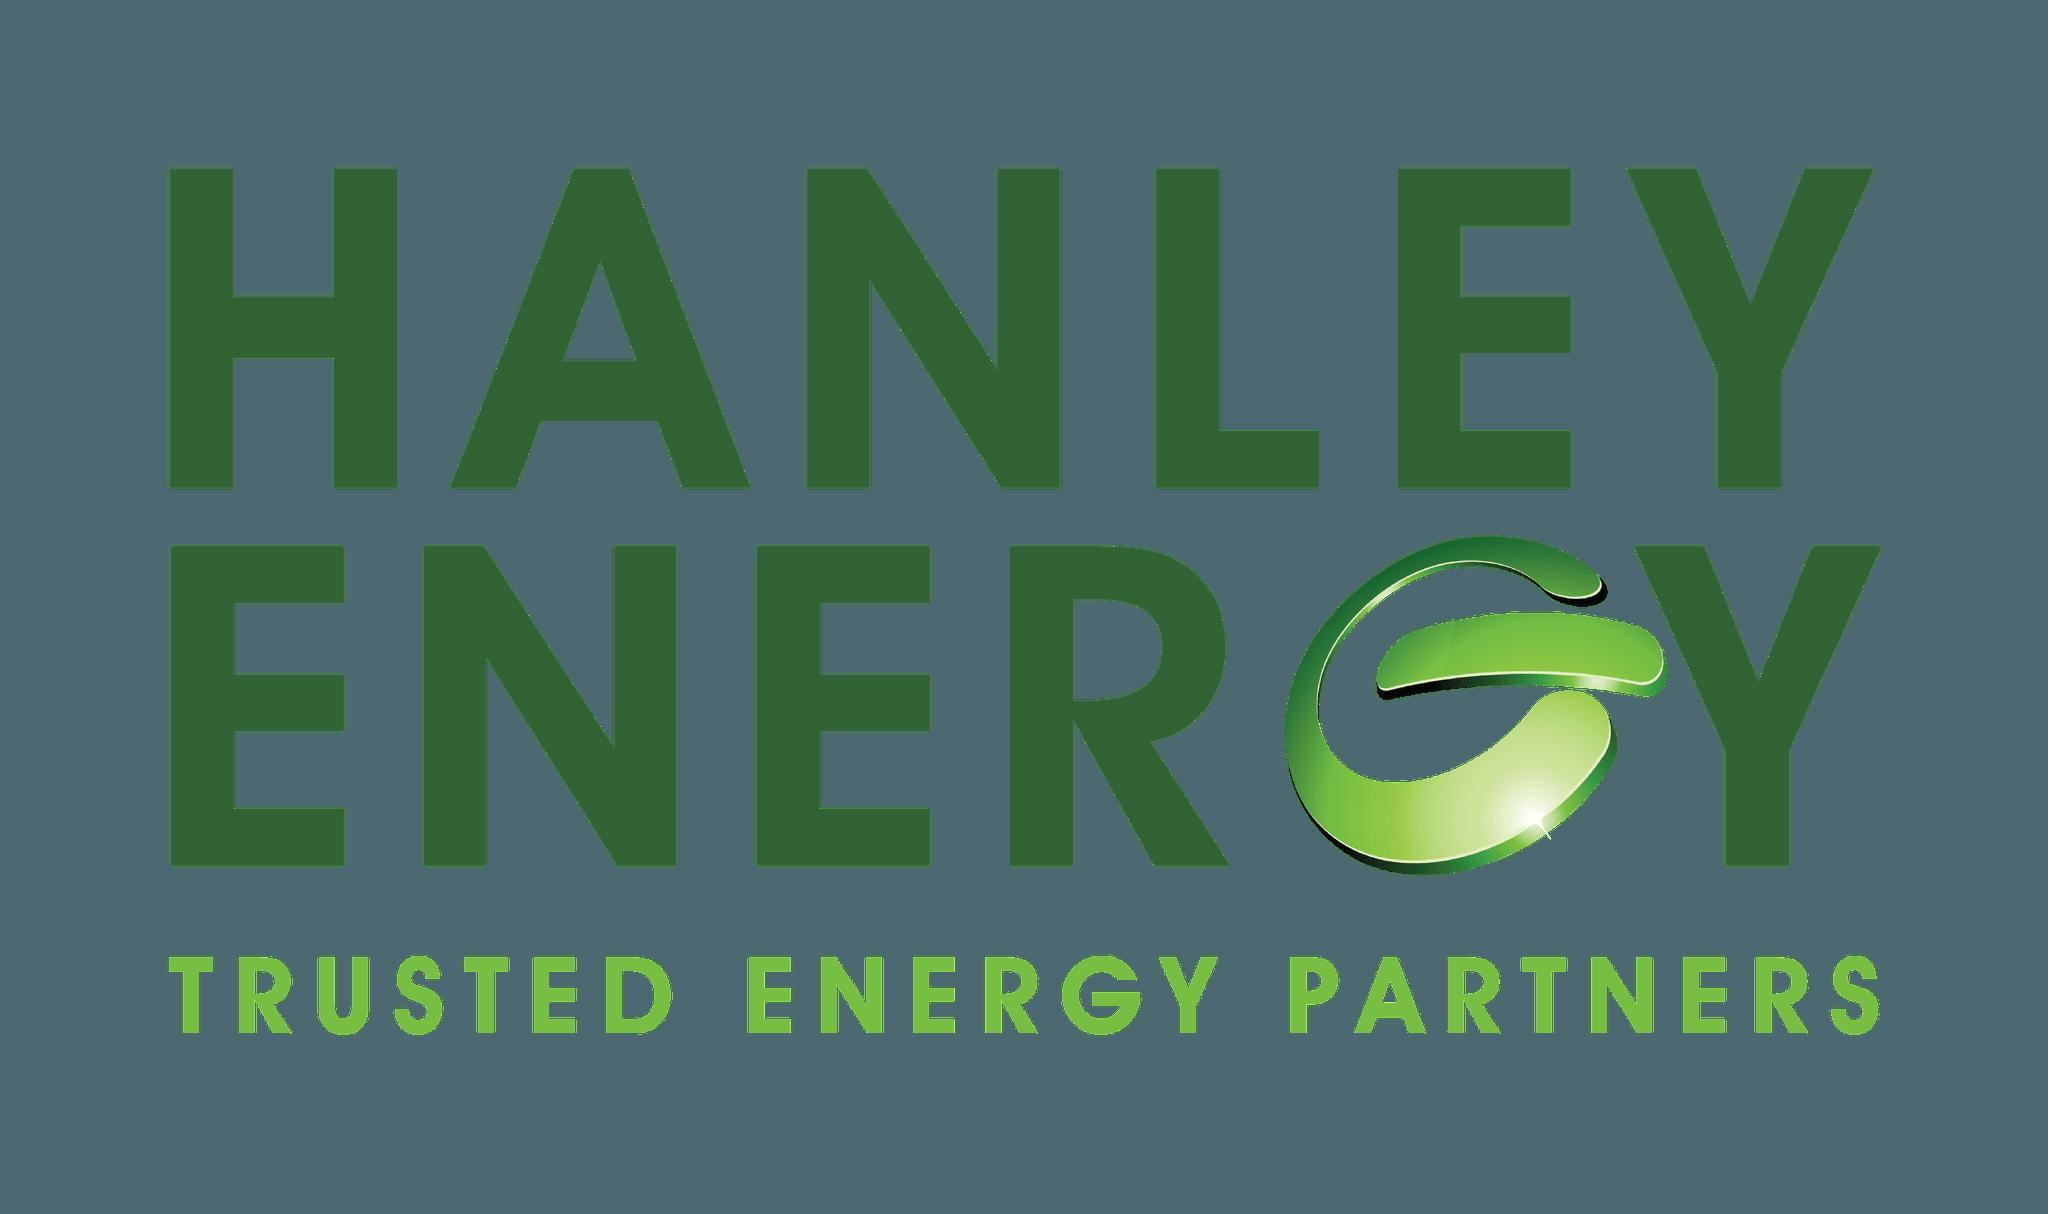 Hanley Energy